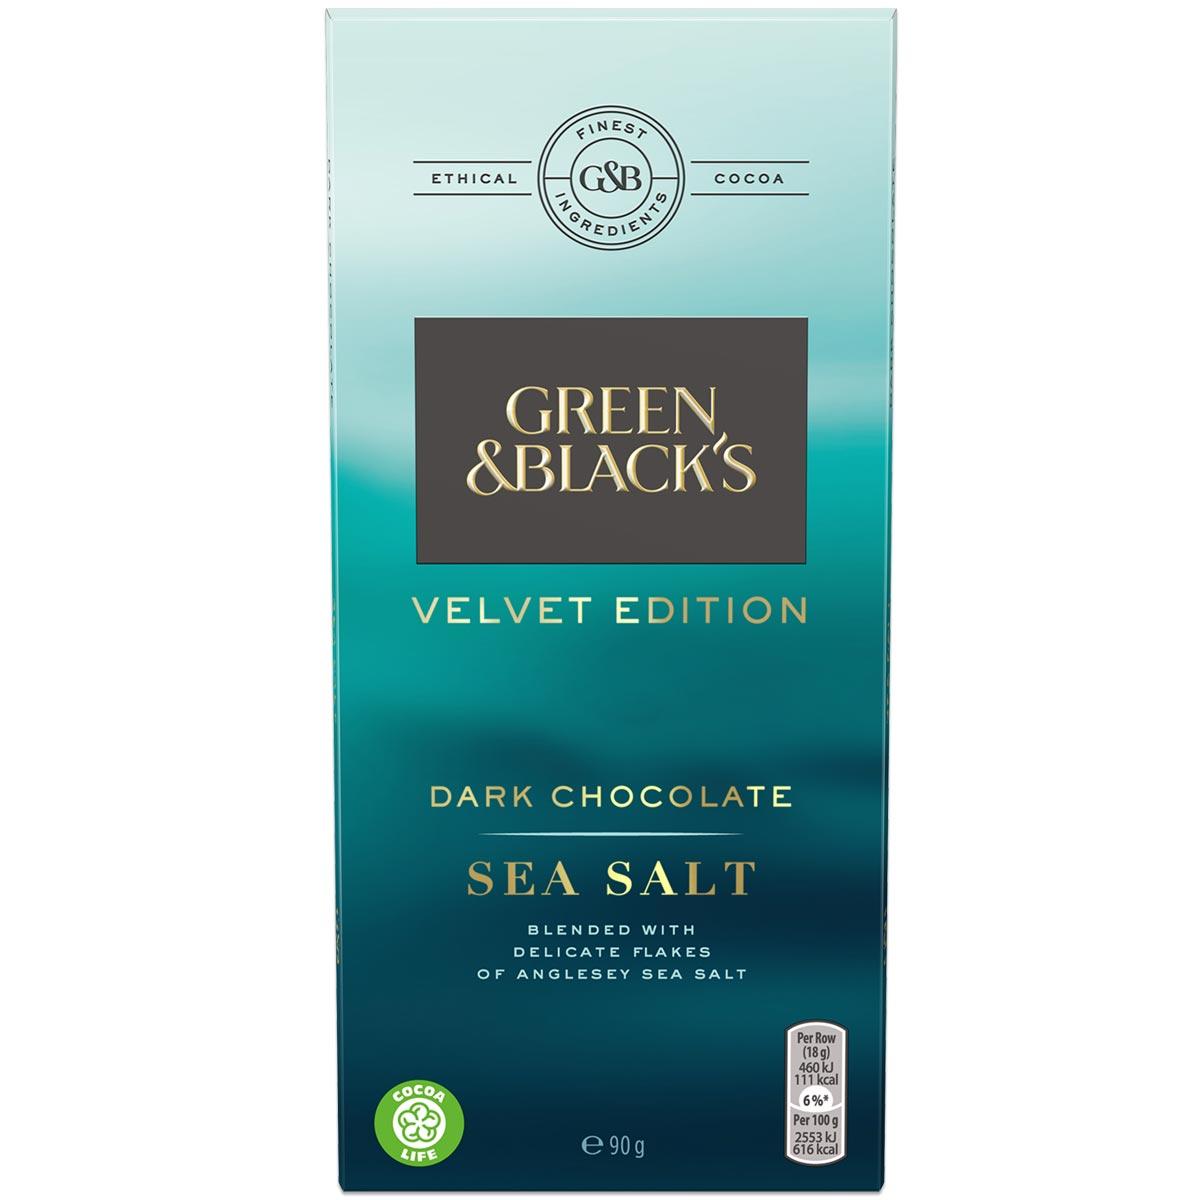 Sea Salt Dark Chocolate 90g Bar Box of 18